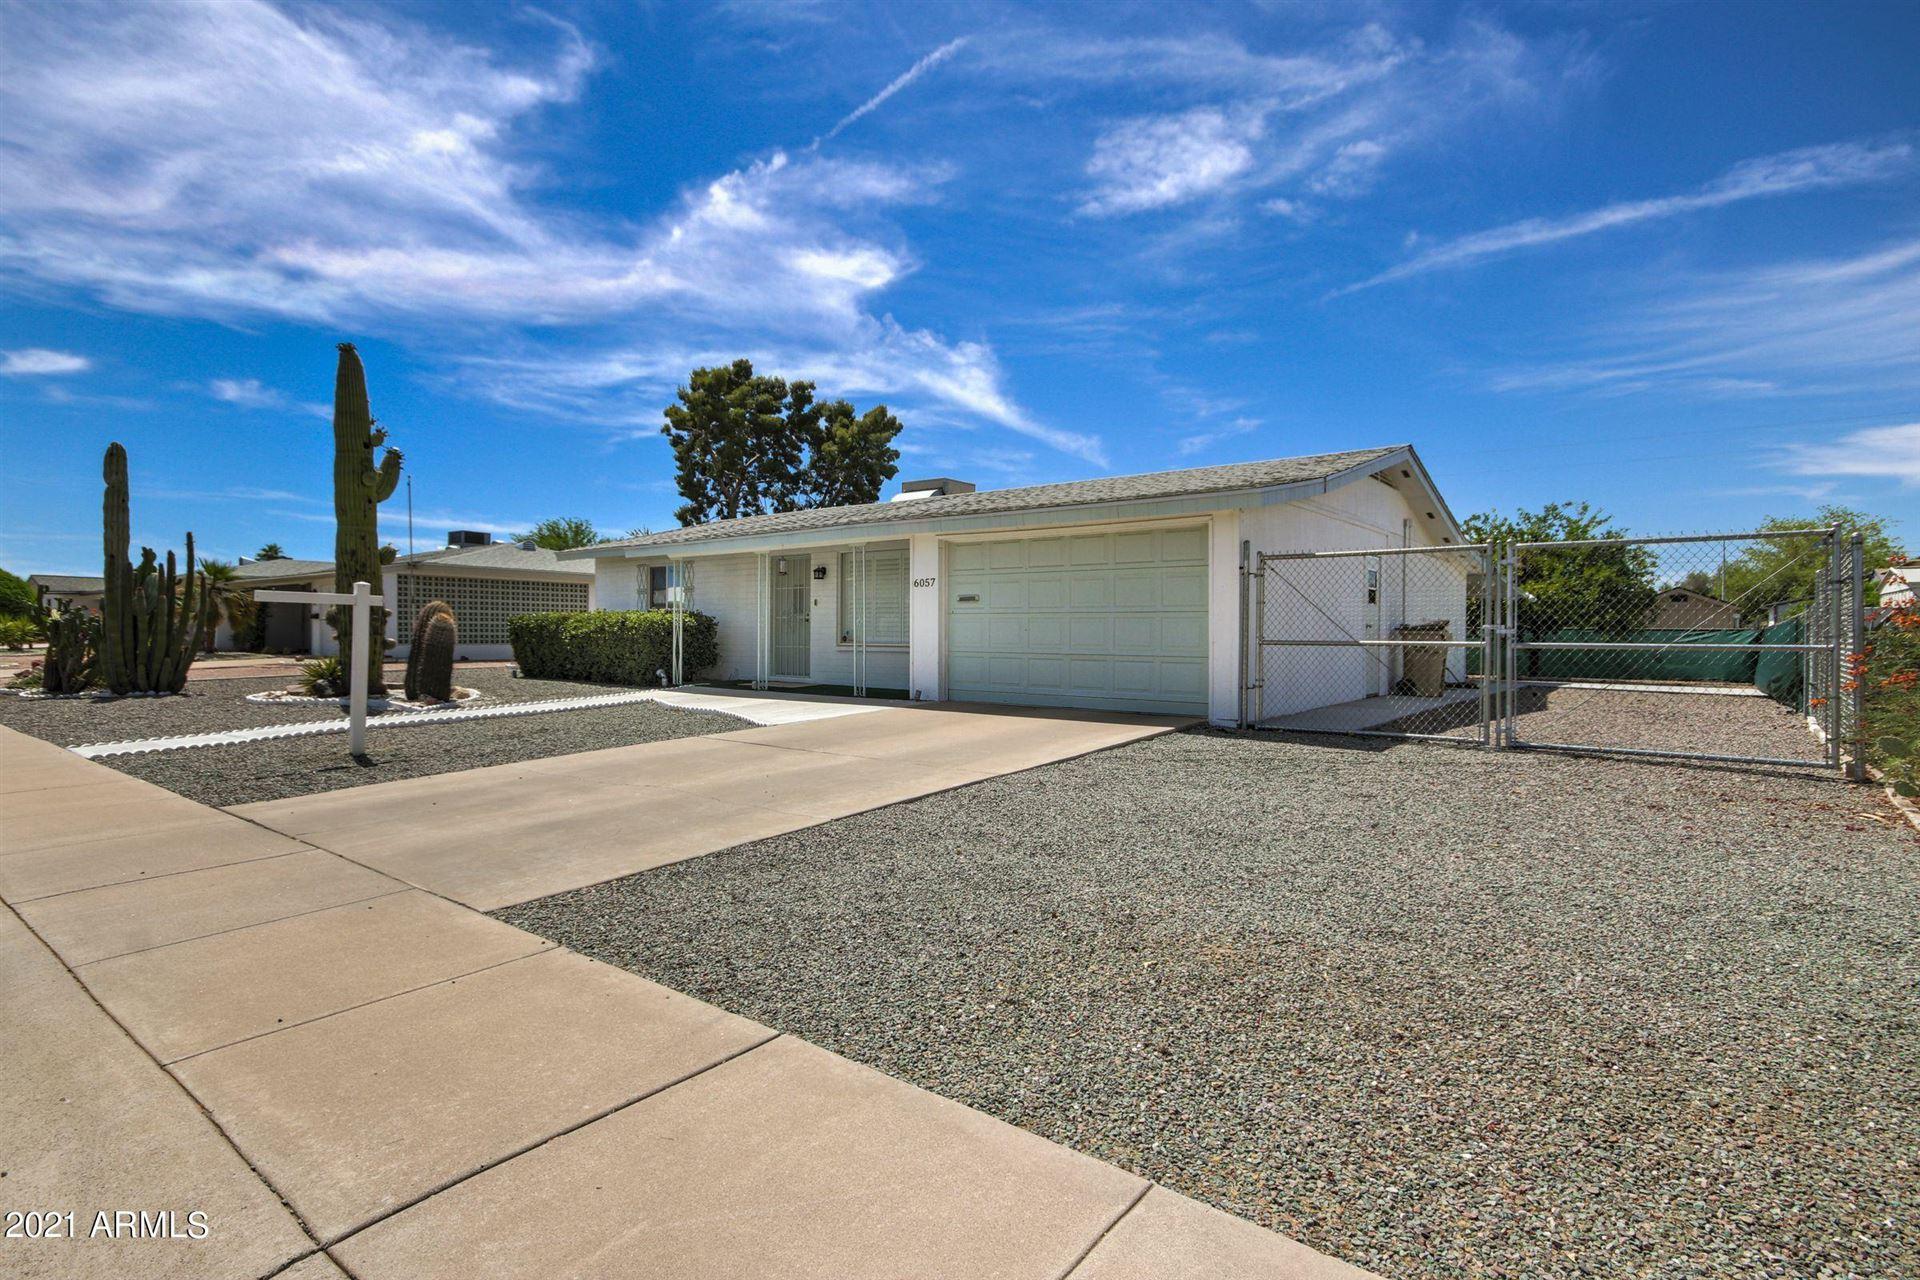 Photo of 6057 E DES MOINES Street, Mesa, AZ 85205 (MLS # 6249861)